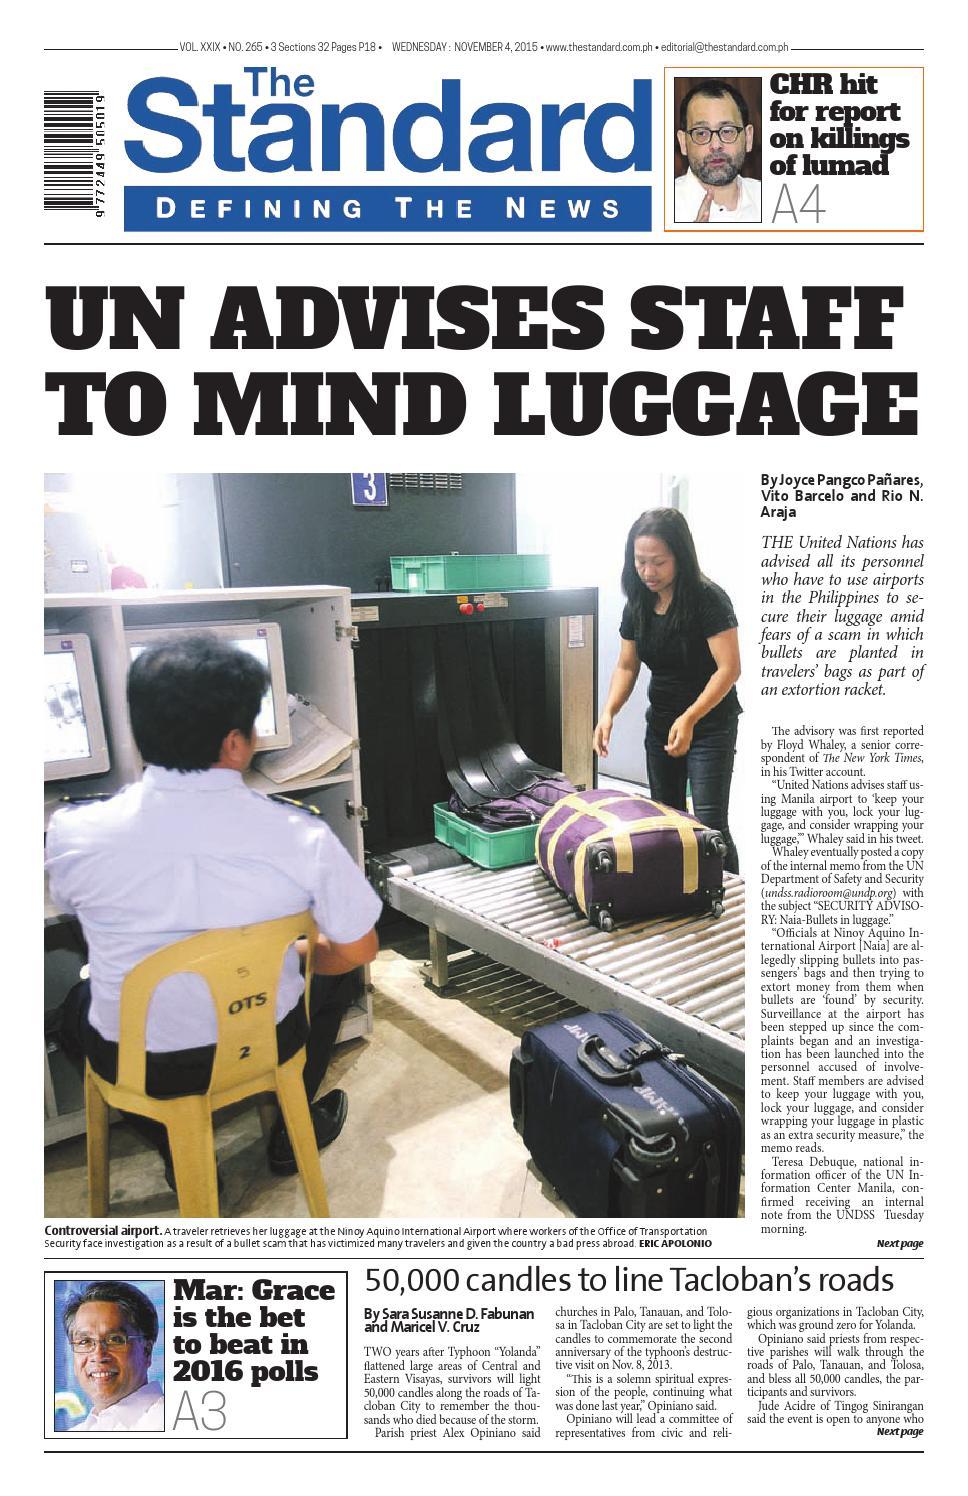 b60e50c56d23 The Standard - 2015 November 04 - Wednesday by Manila Standard - issuu